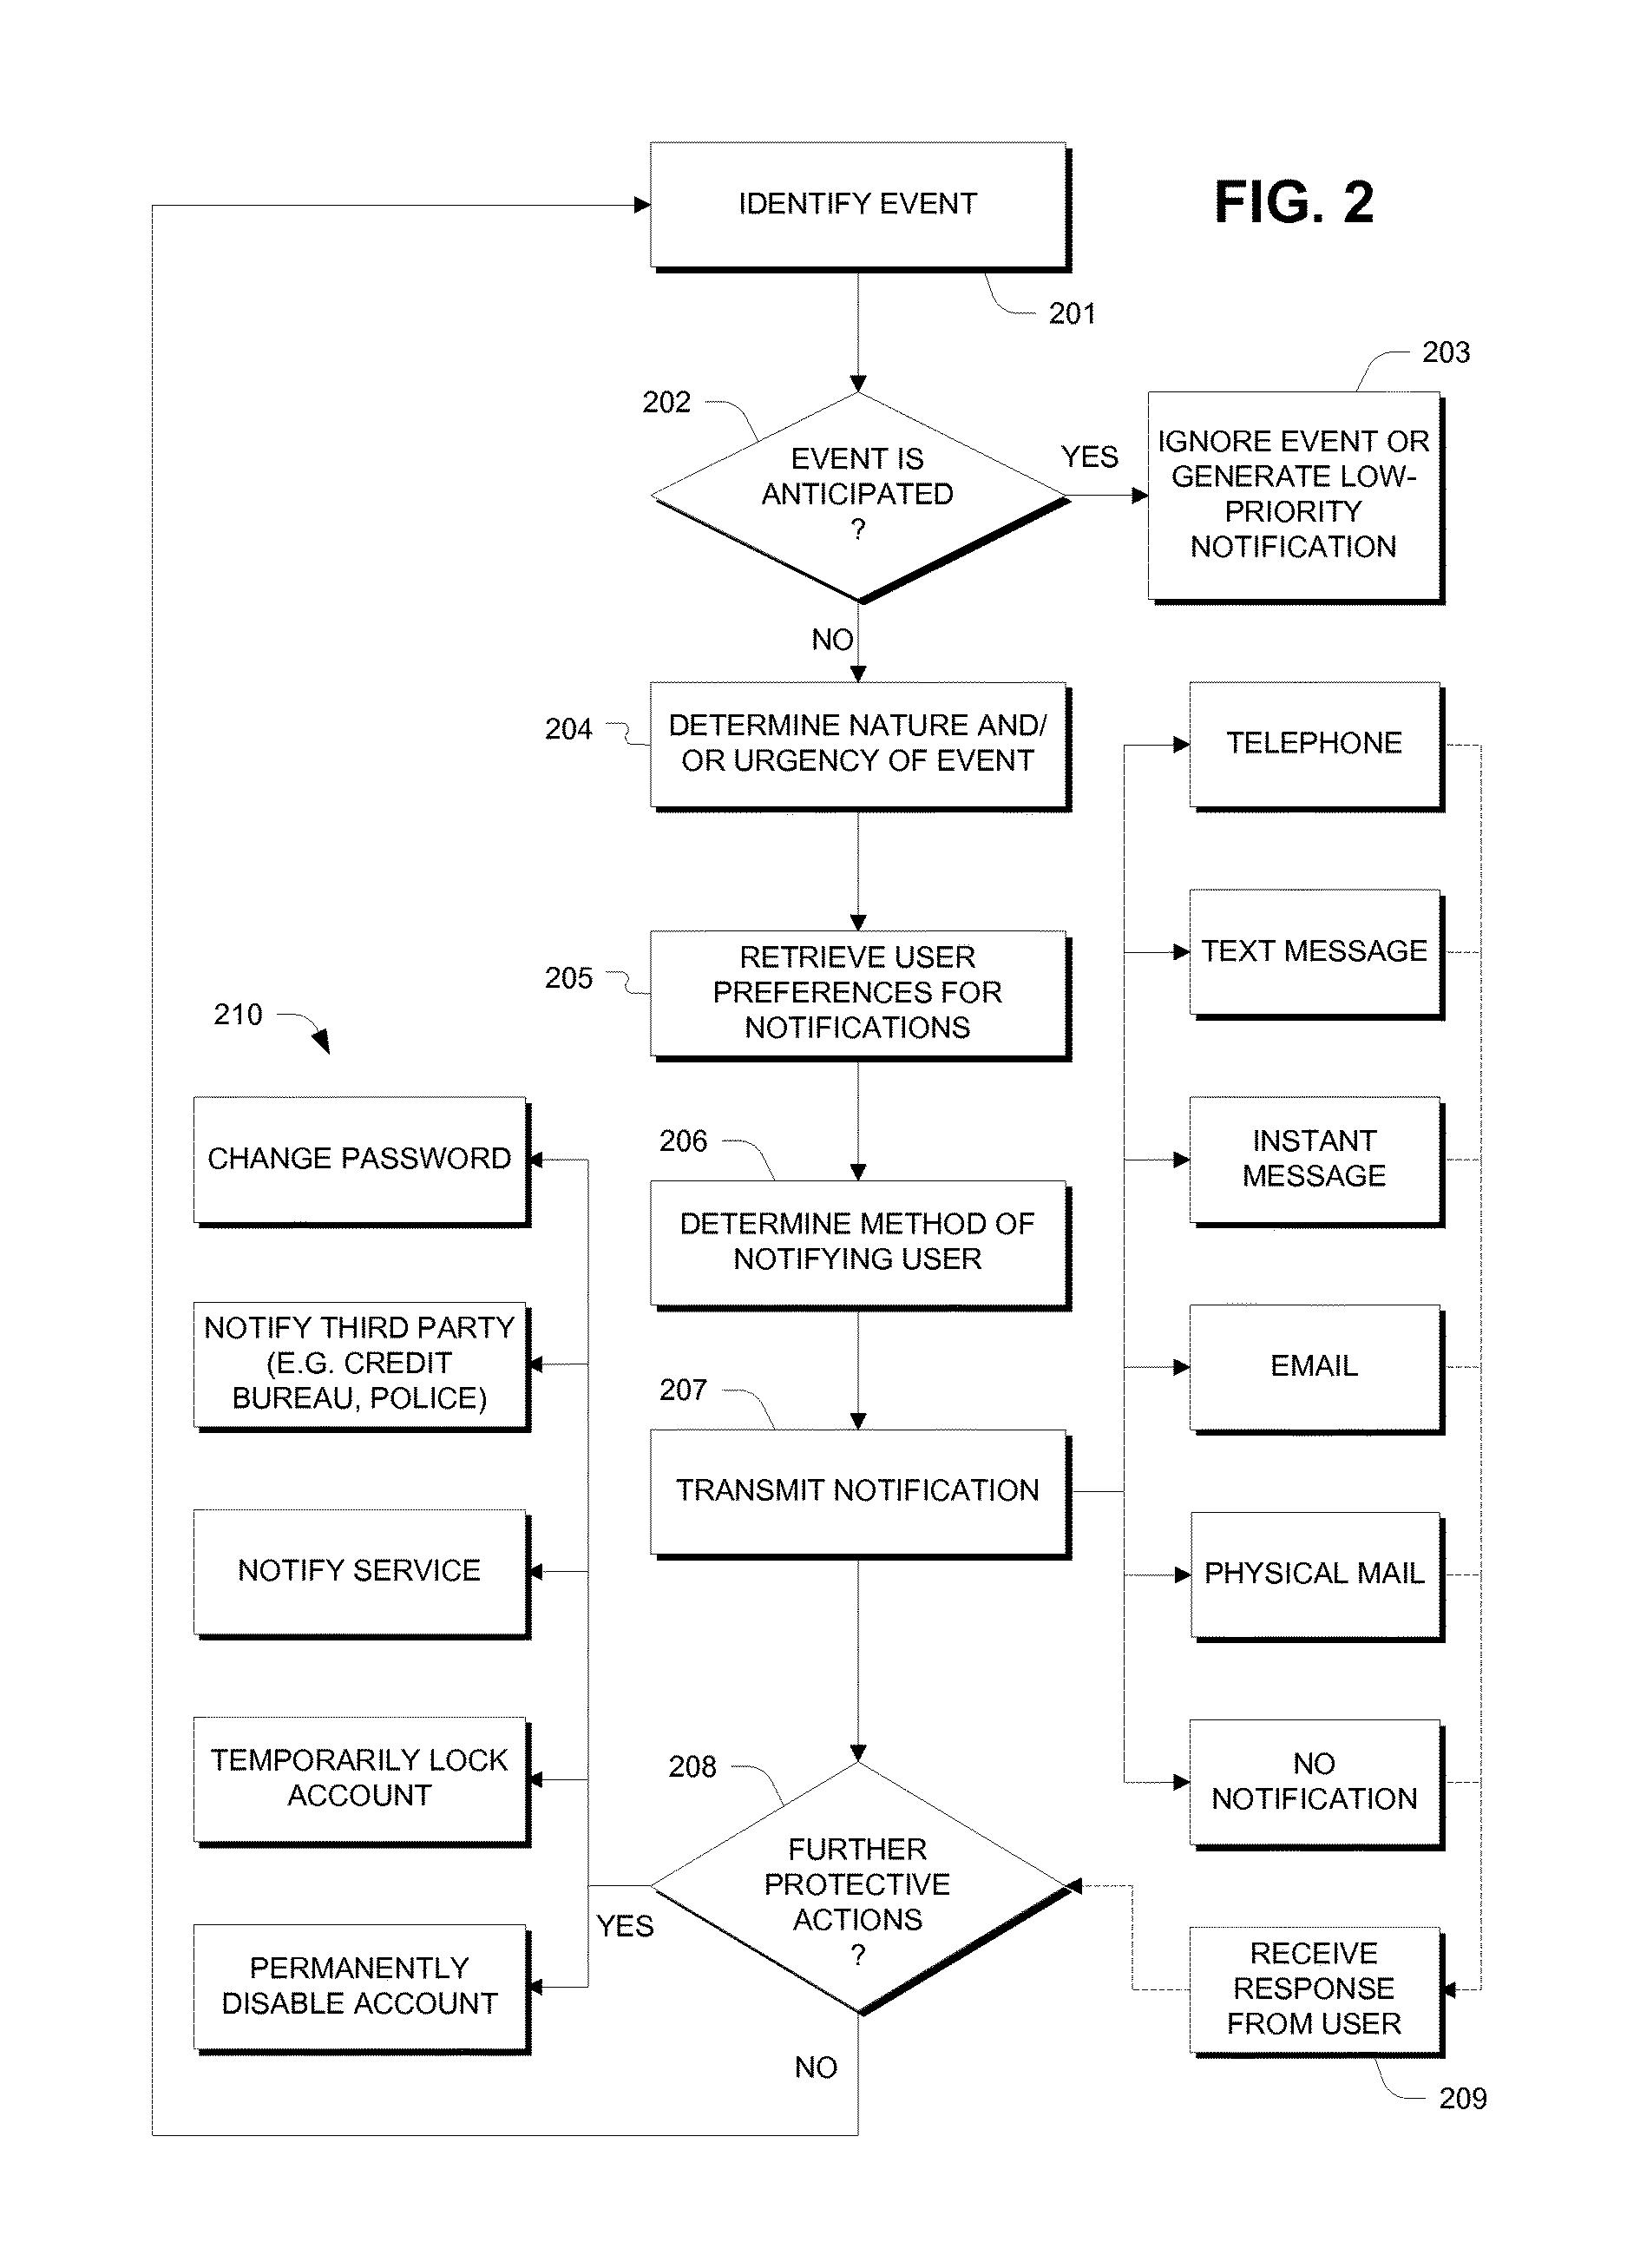 Patent US 9,542,553 B1